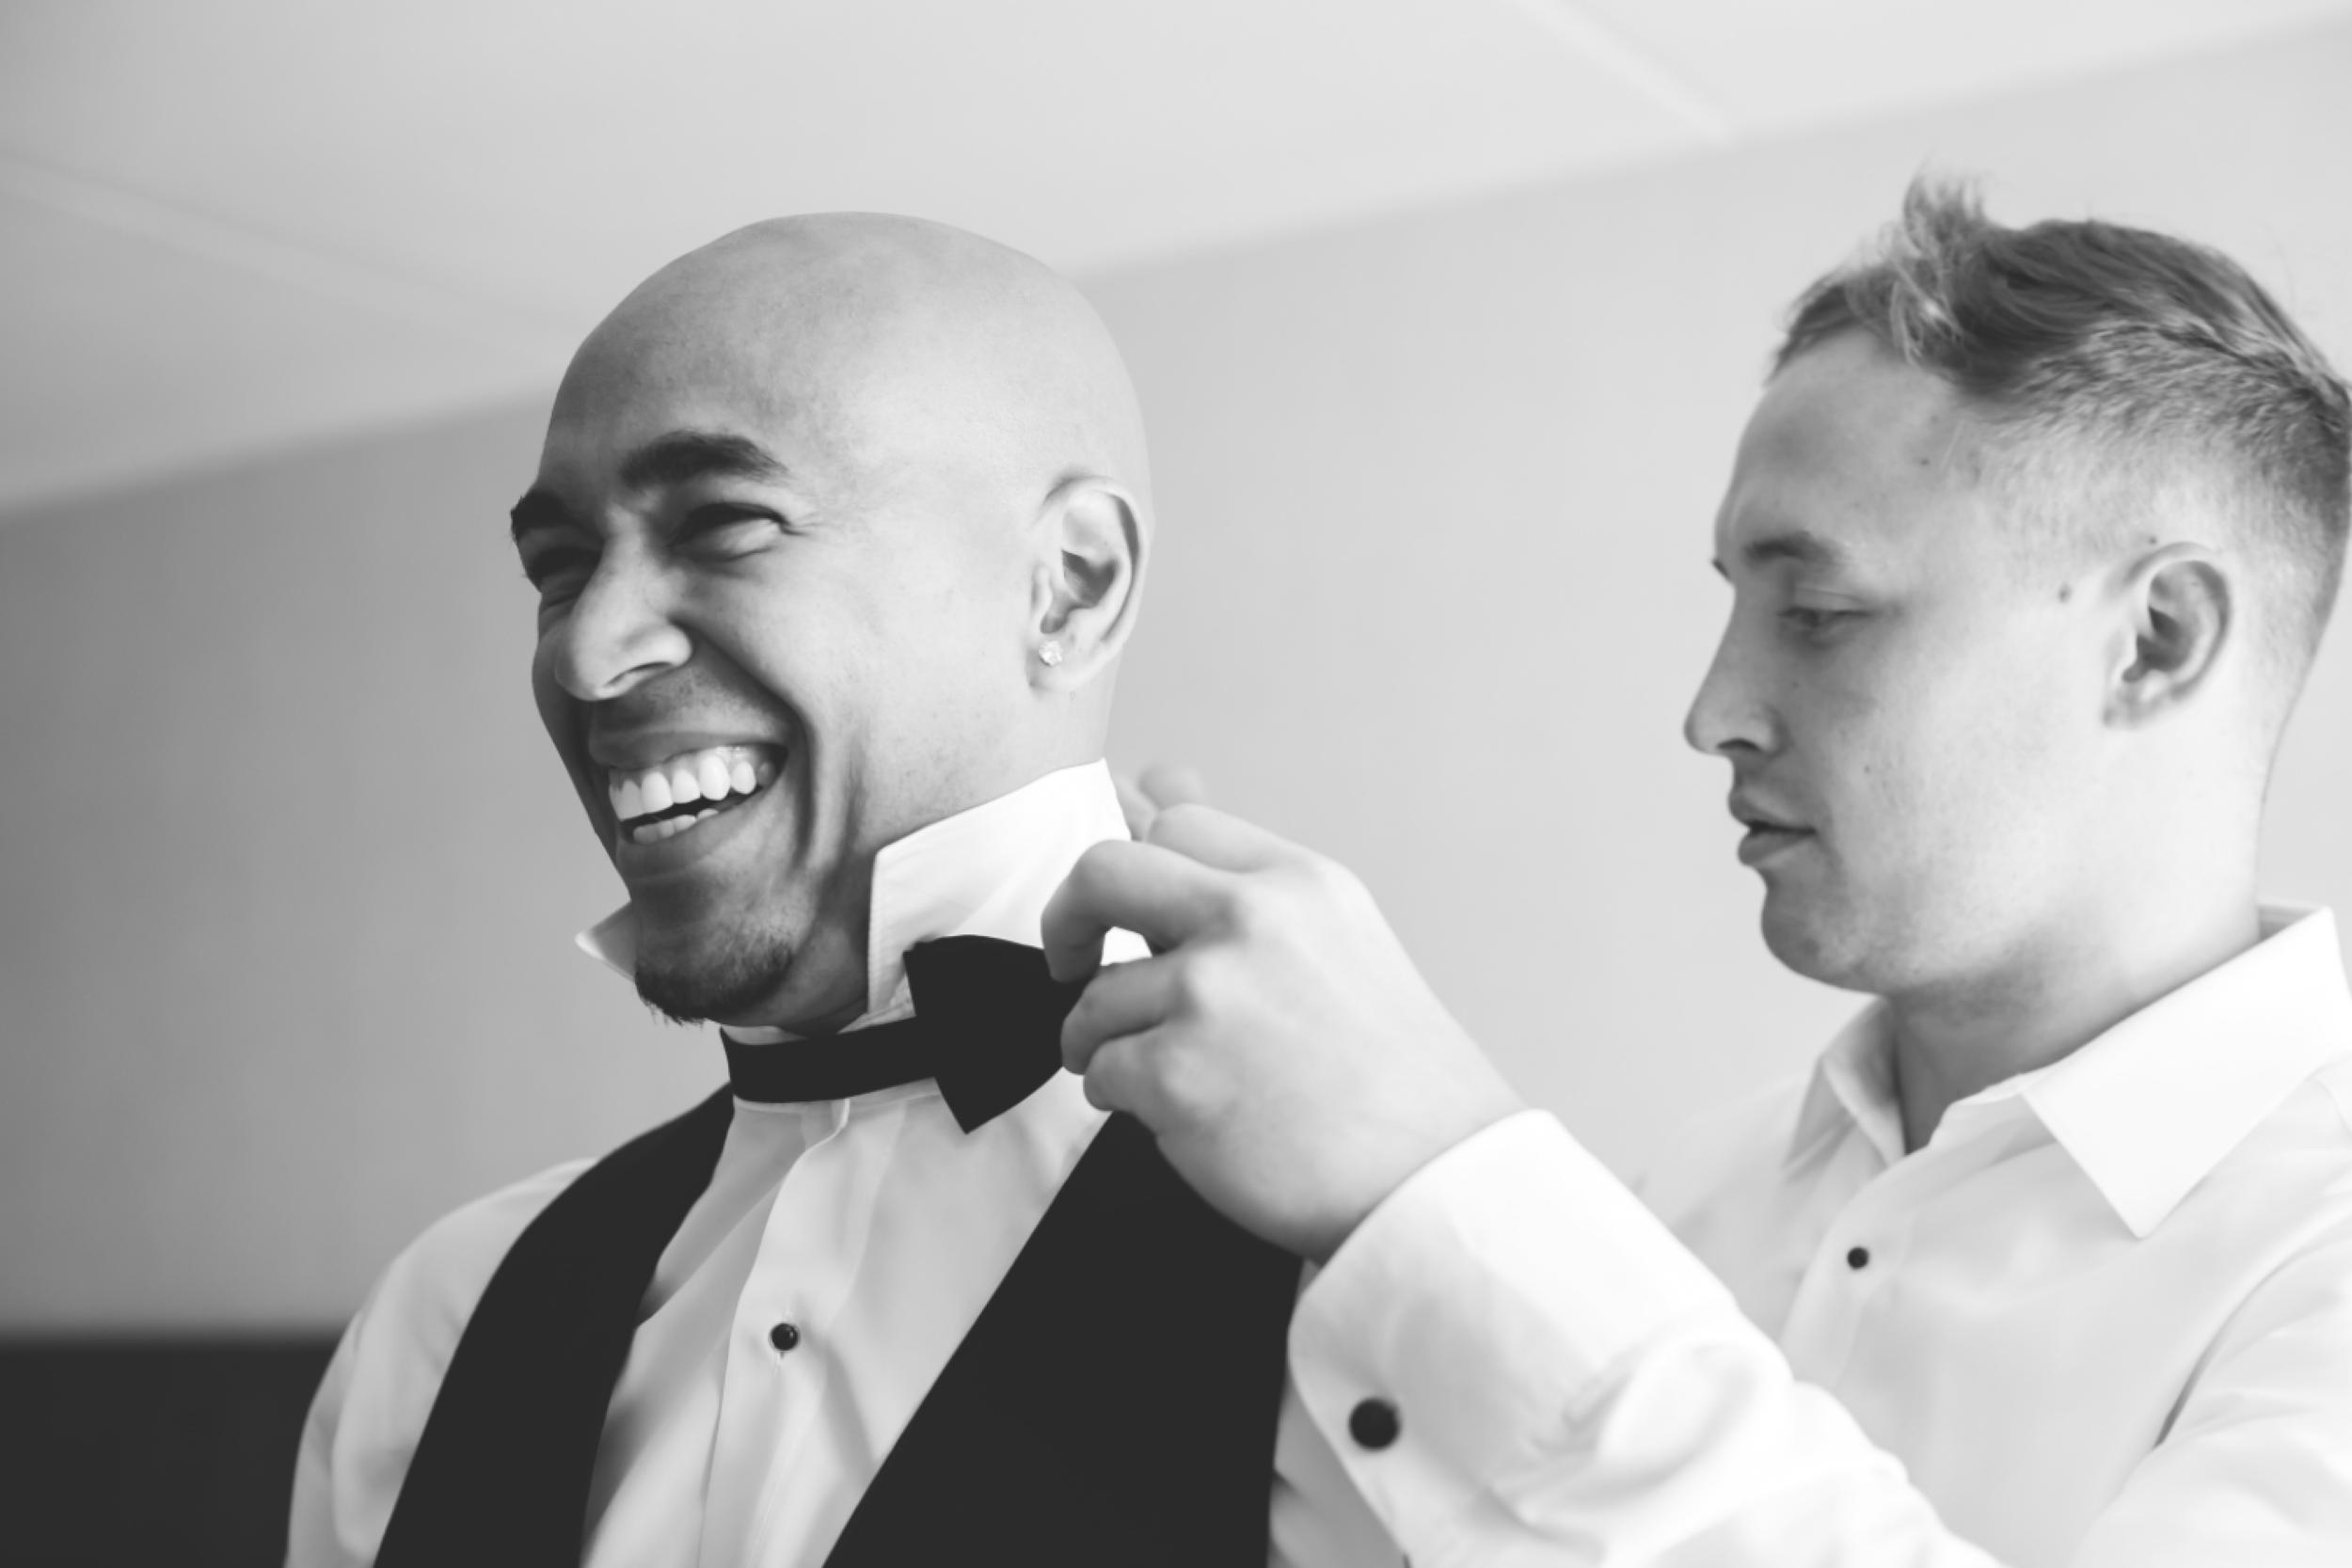 Wedding-Burlington-Convention-Center-Burlington-Oakville-Toronto-Hamilton-Niagara-Wedding-Photographer-Photography-Moments-by-Lauren-Photo-Image-12.png